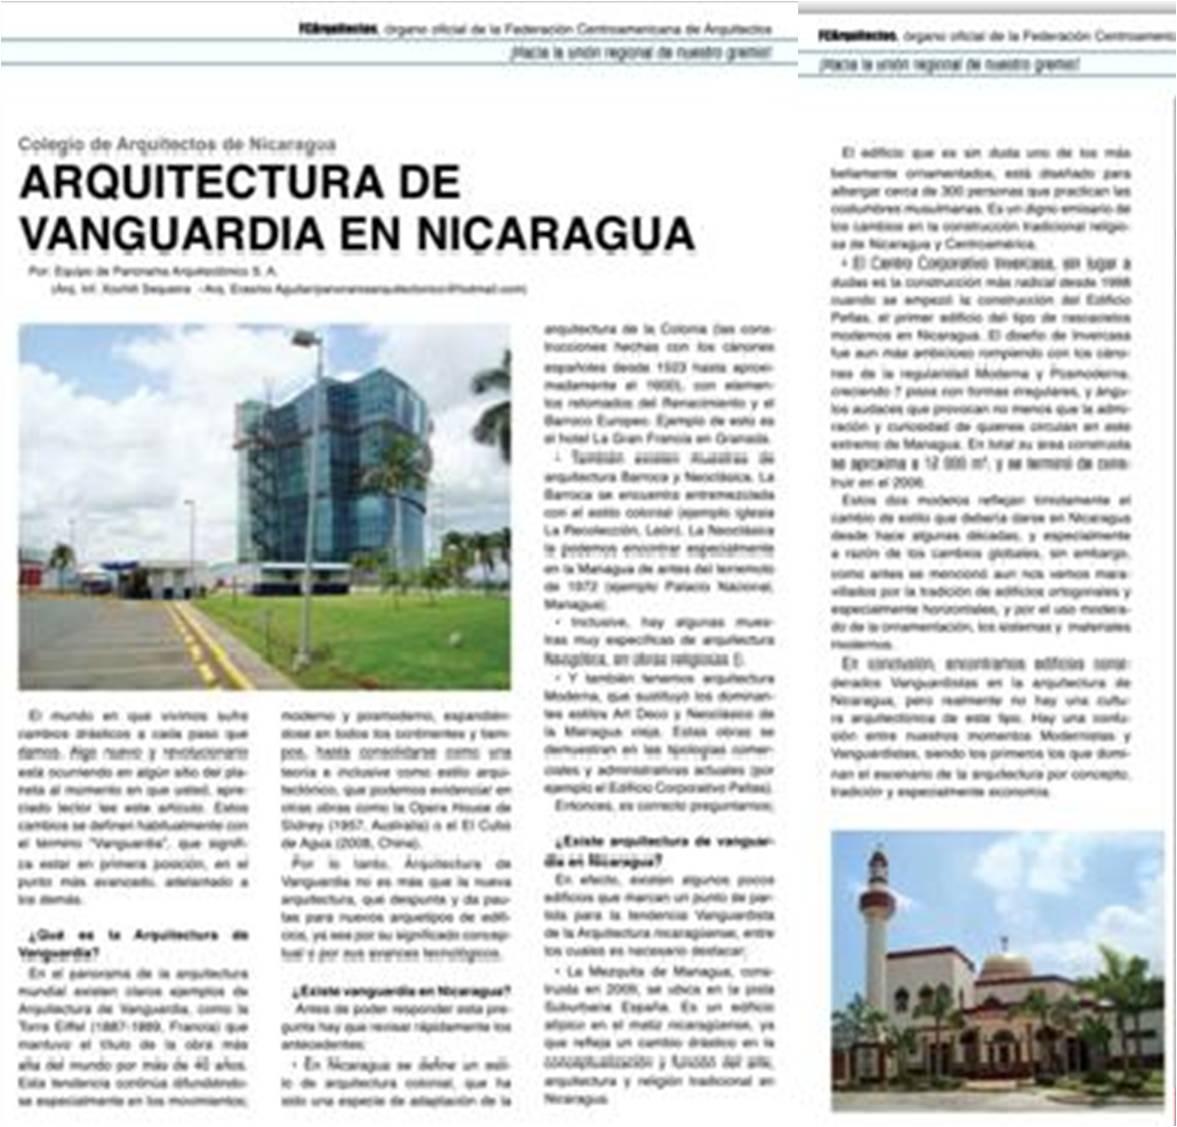 colegio de arquitectos de nicaragua coan arquitectura de On articulos arquitectura